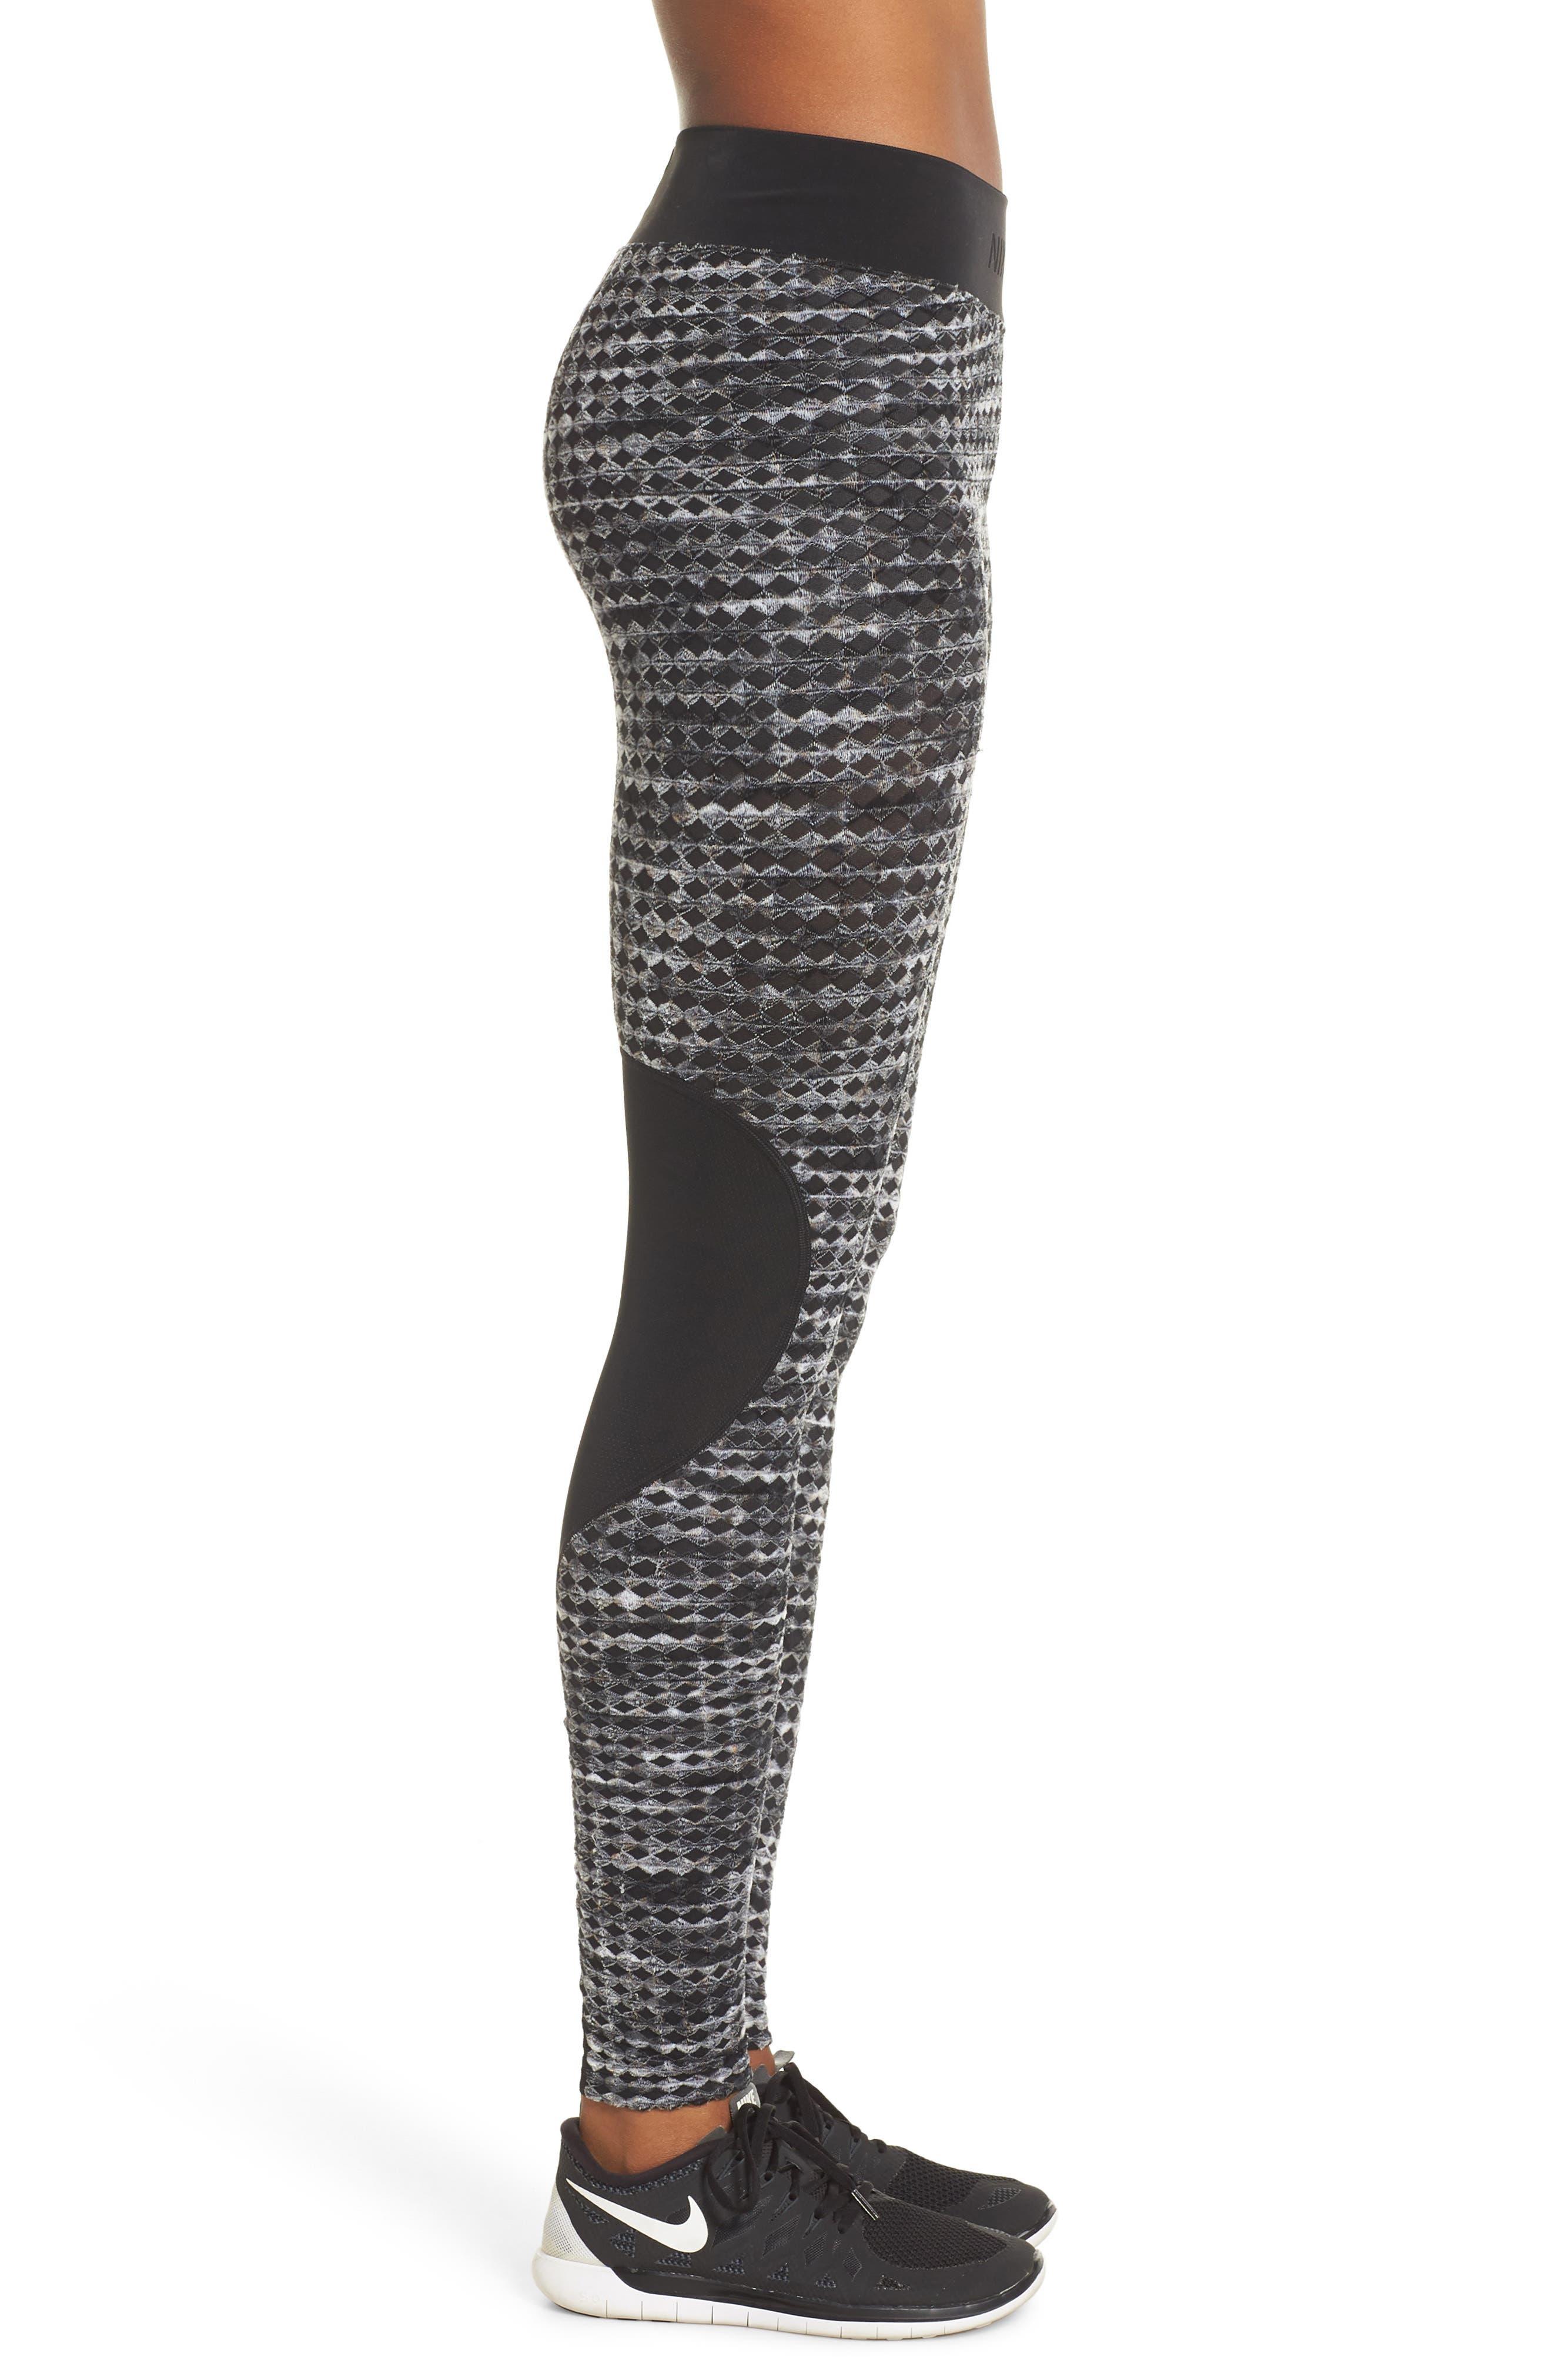 Pro HyperWarm Leggings,                             Alternate thumbnail 3, color,                             BLACK/ BLACK